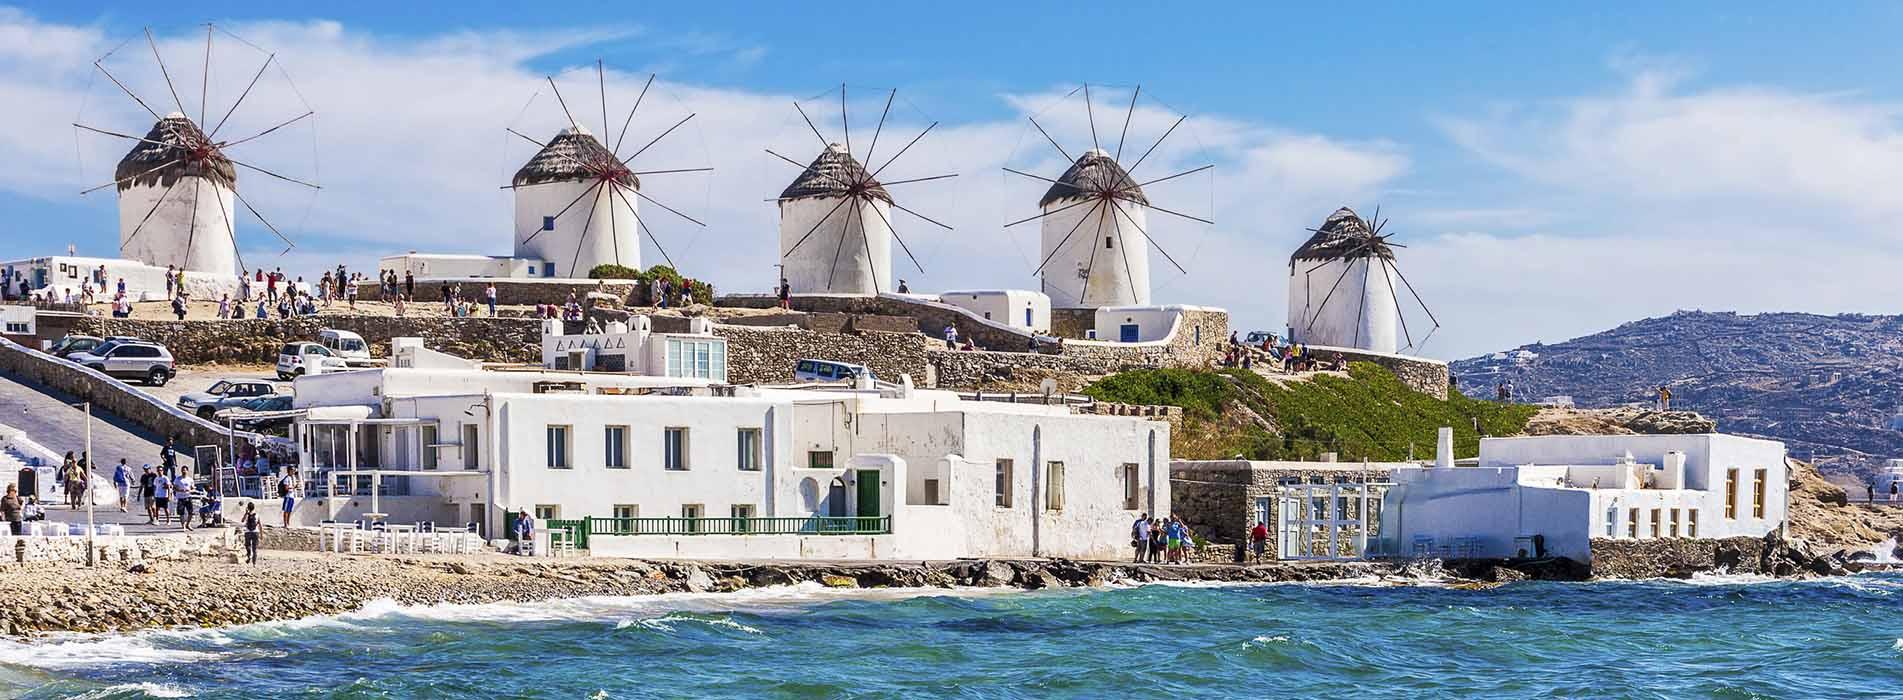 Greece - Mykonos 2 (main)